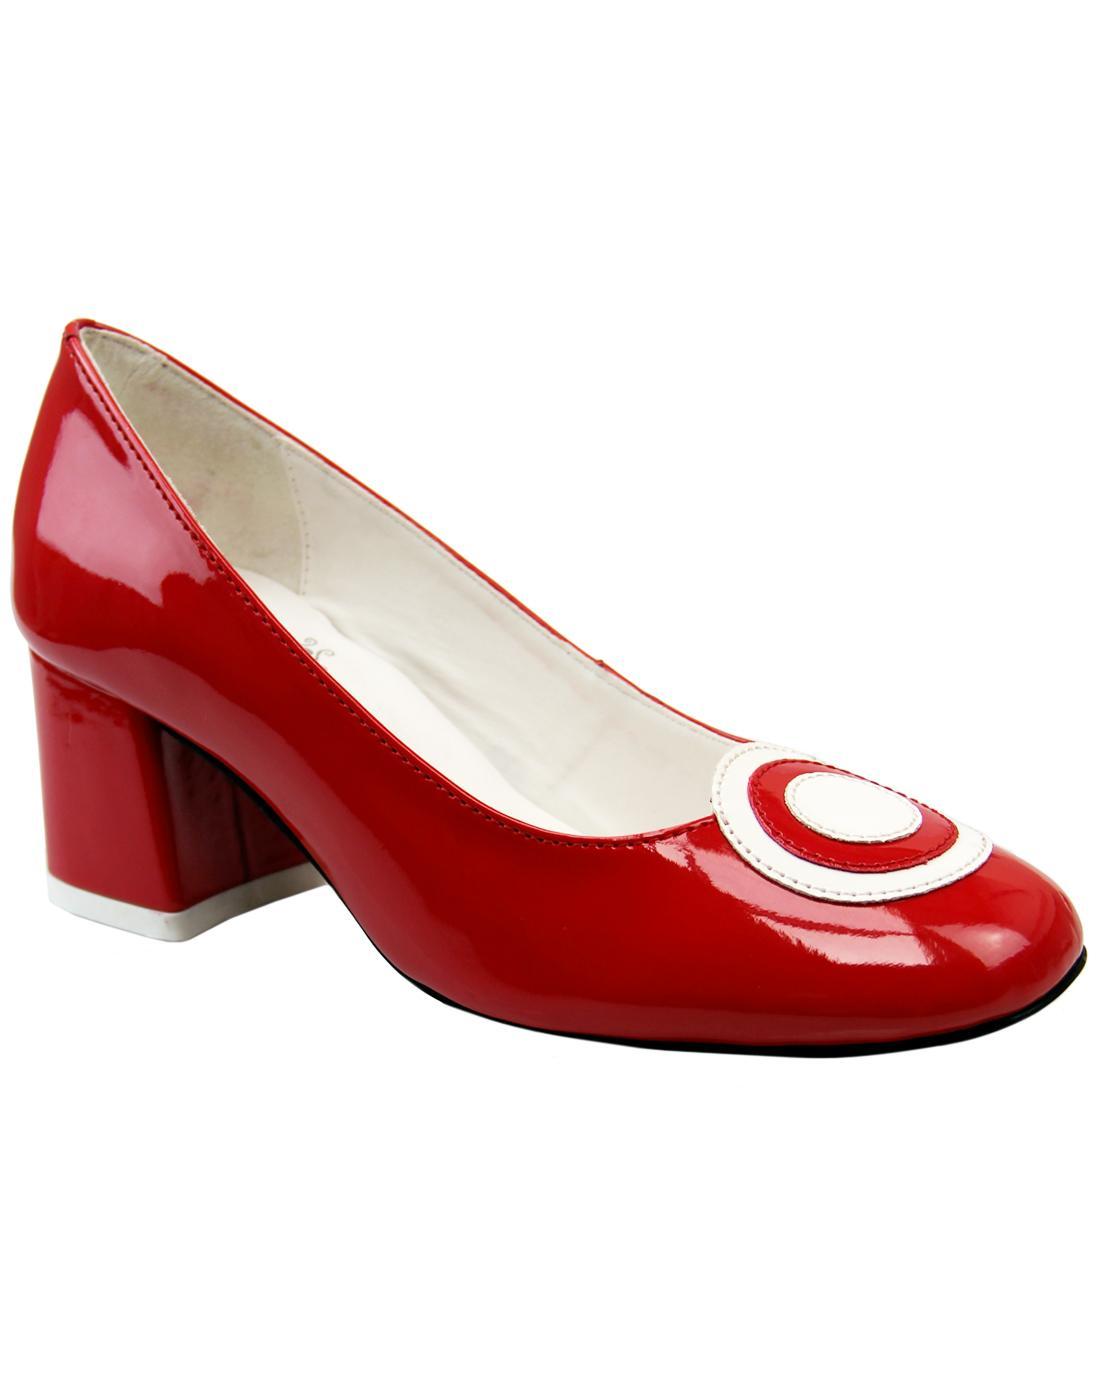 Penny MADCAP ENGLAND 60s Mod Target Toe Shoes